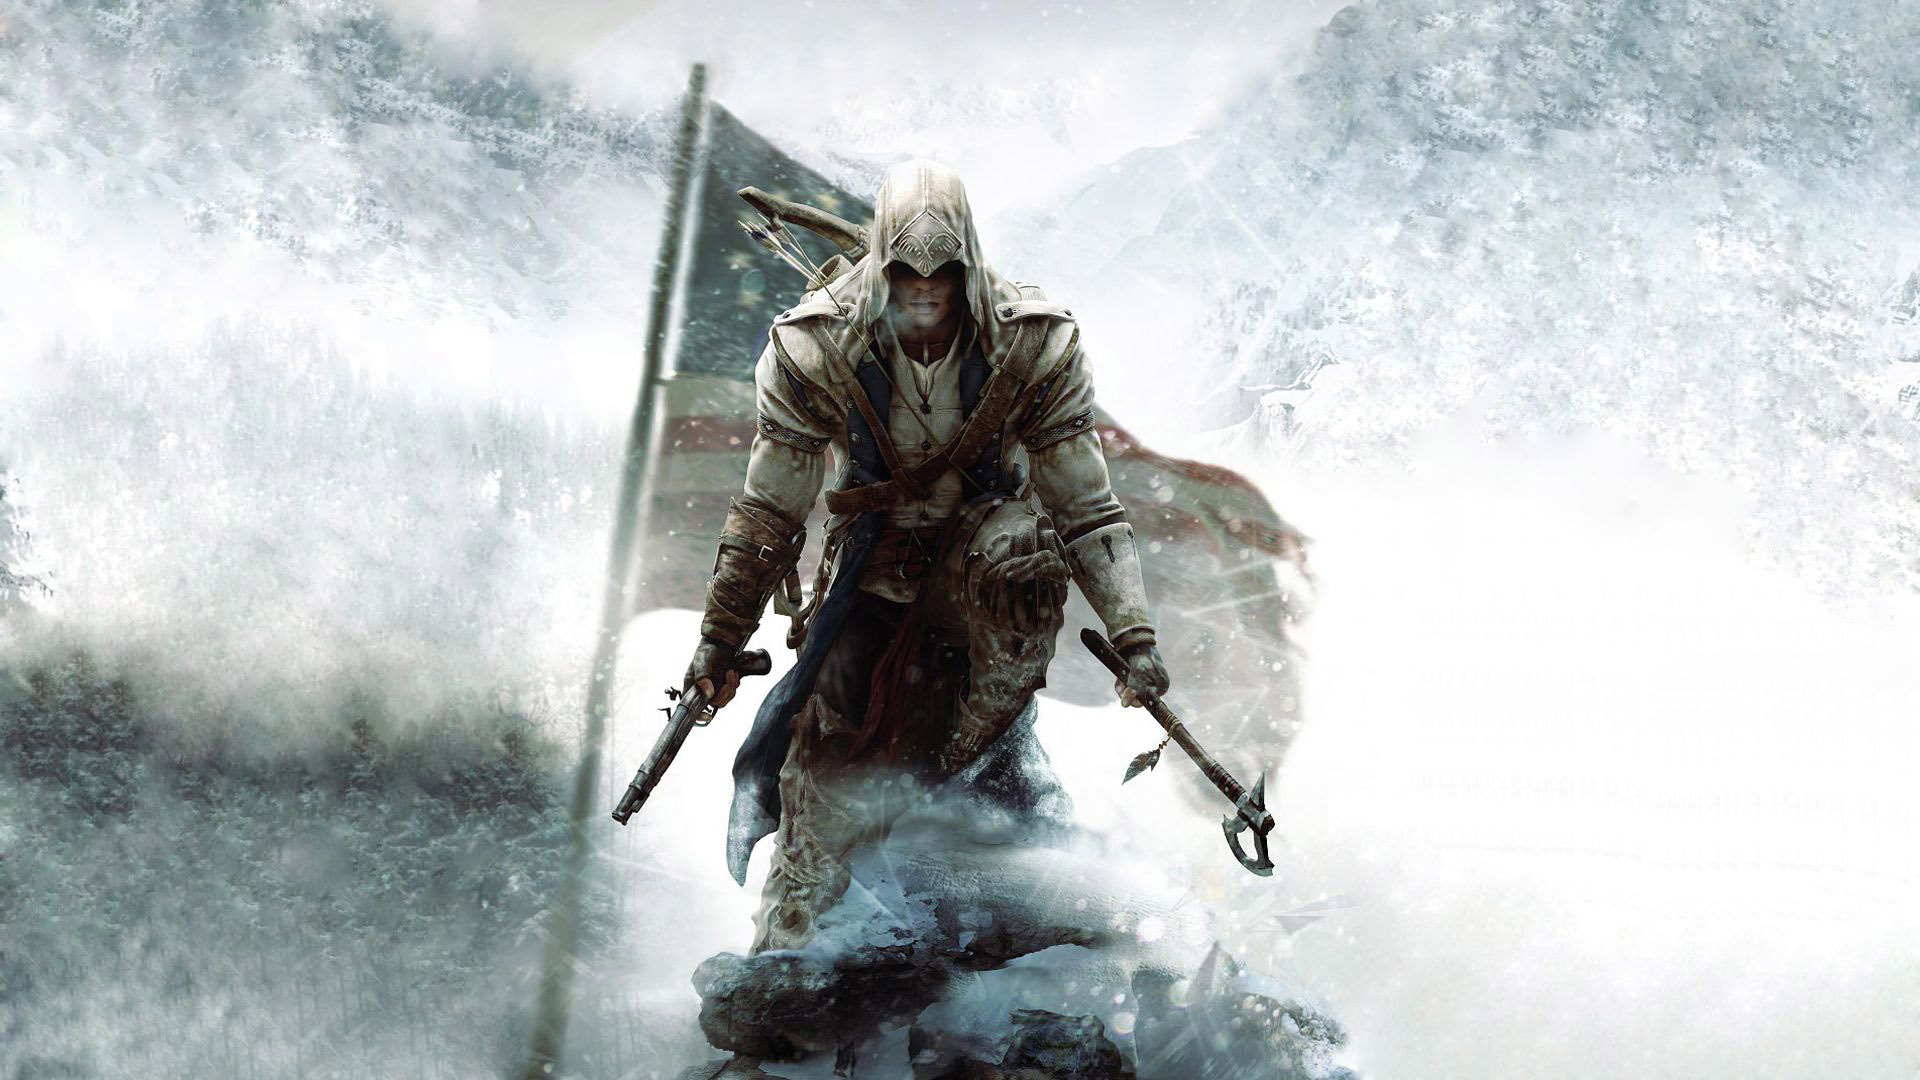 Connor Kenway   Assassins Creed III wallpaper 16997 1920x1080